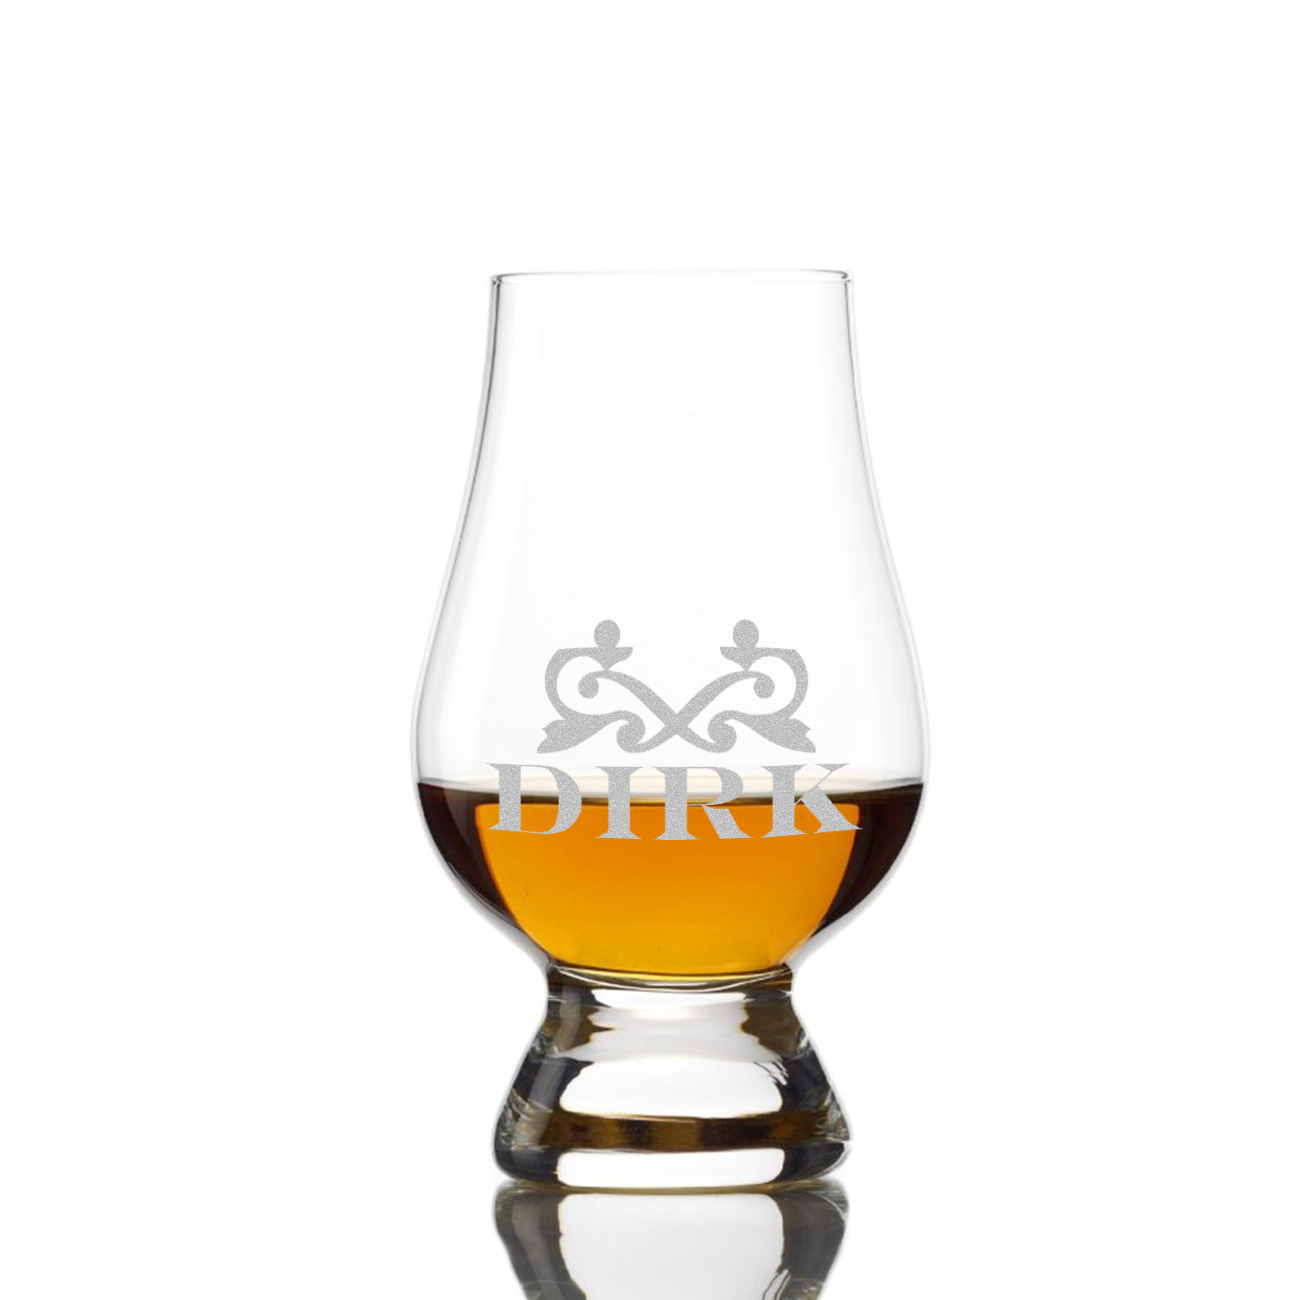 glencairn glass malt whisky nosing glas mit gravur ebay. Black Bedroom Furniture Sets. Home Design Ideas